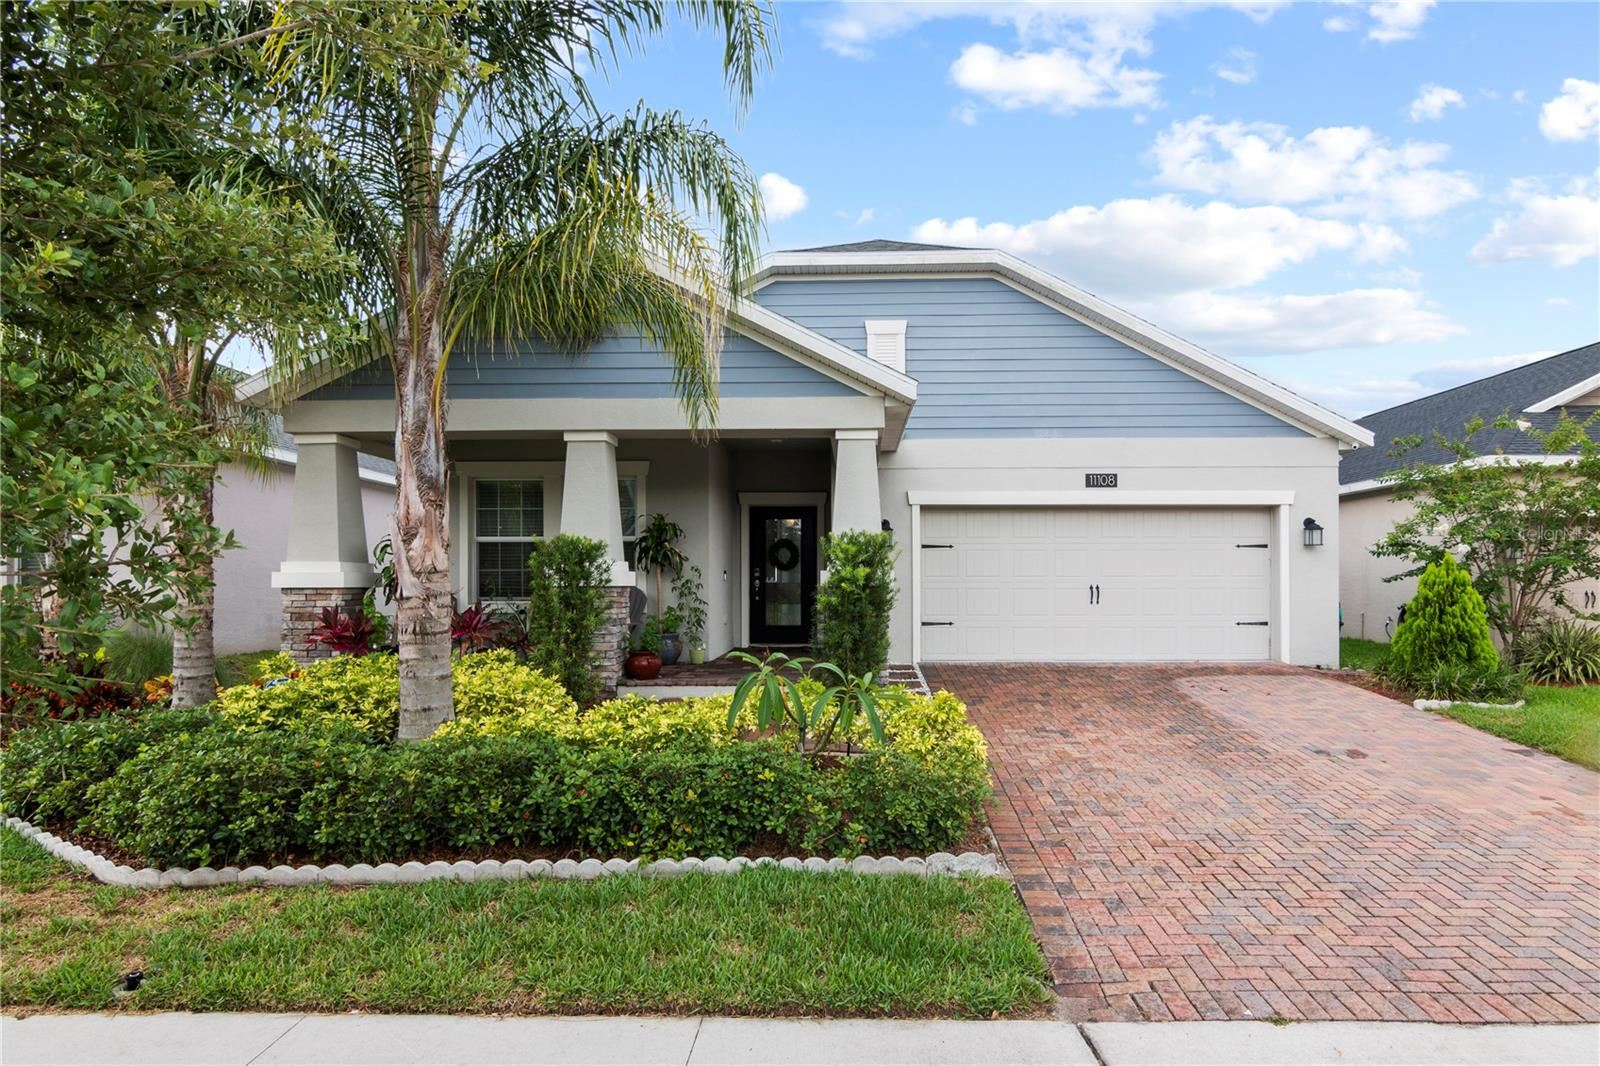 11108 SYCAMORE WOODS DRIVE, Orlando, FL 32832 - MLS#: O5952213